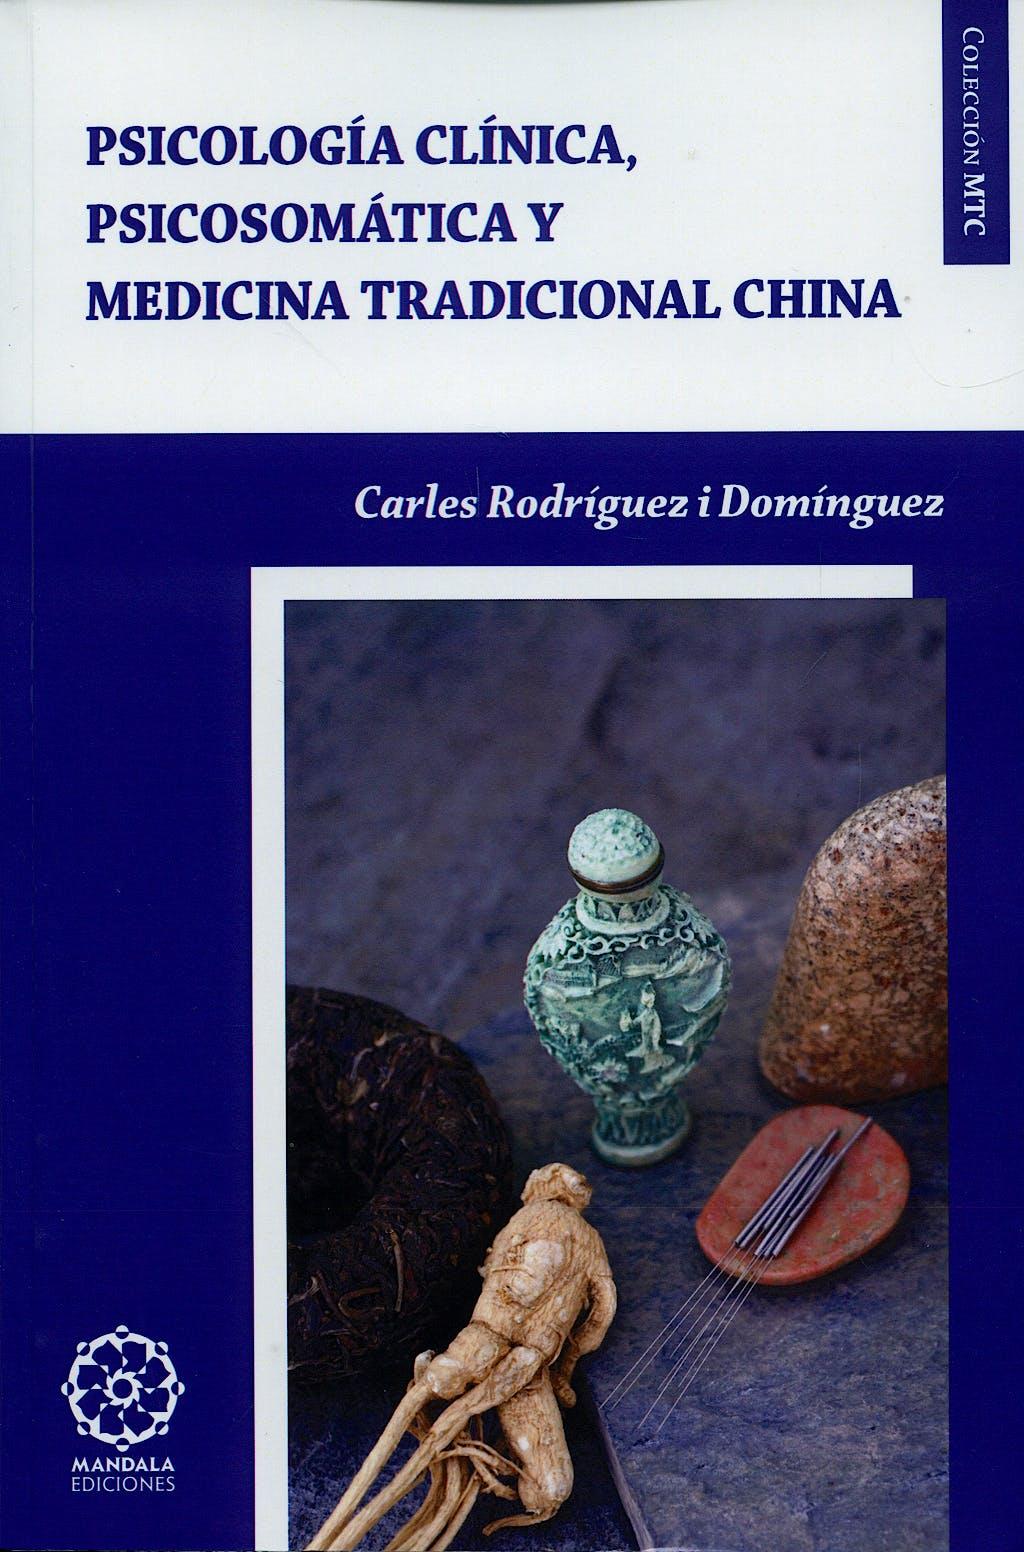 Portada del libro 9788483520734 Psicologia Clinica, Psicosomatica y Medicina Tradicional China